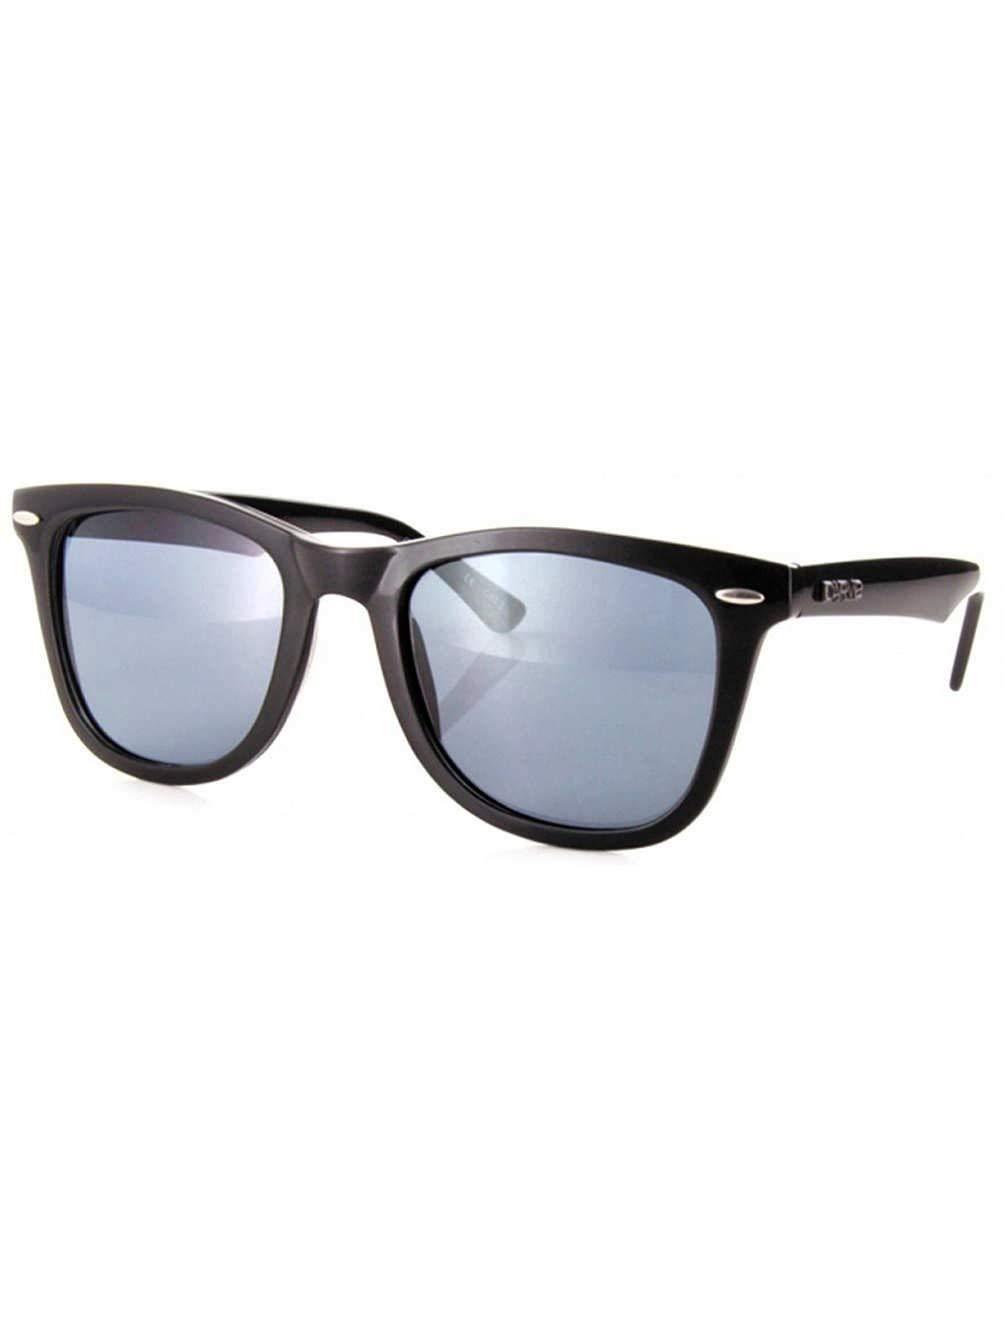 dcc72500cee5 Carve Wow Vision Sunglasses